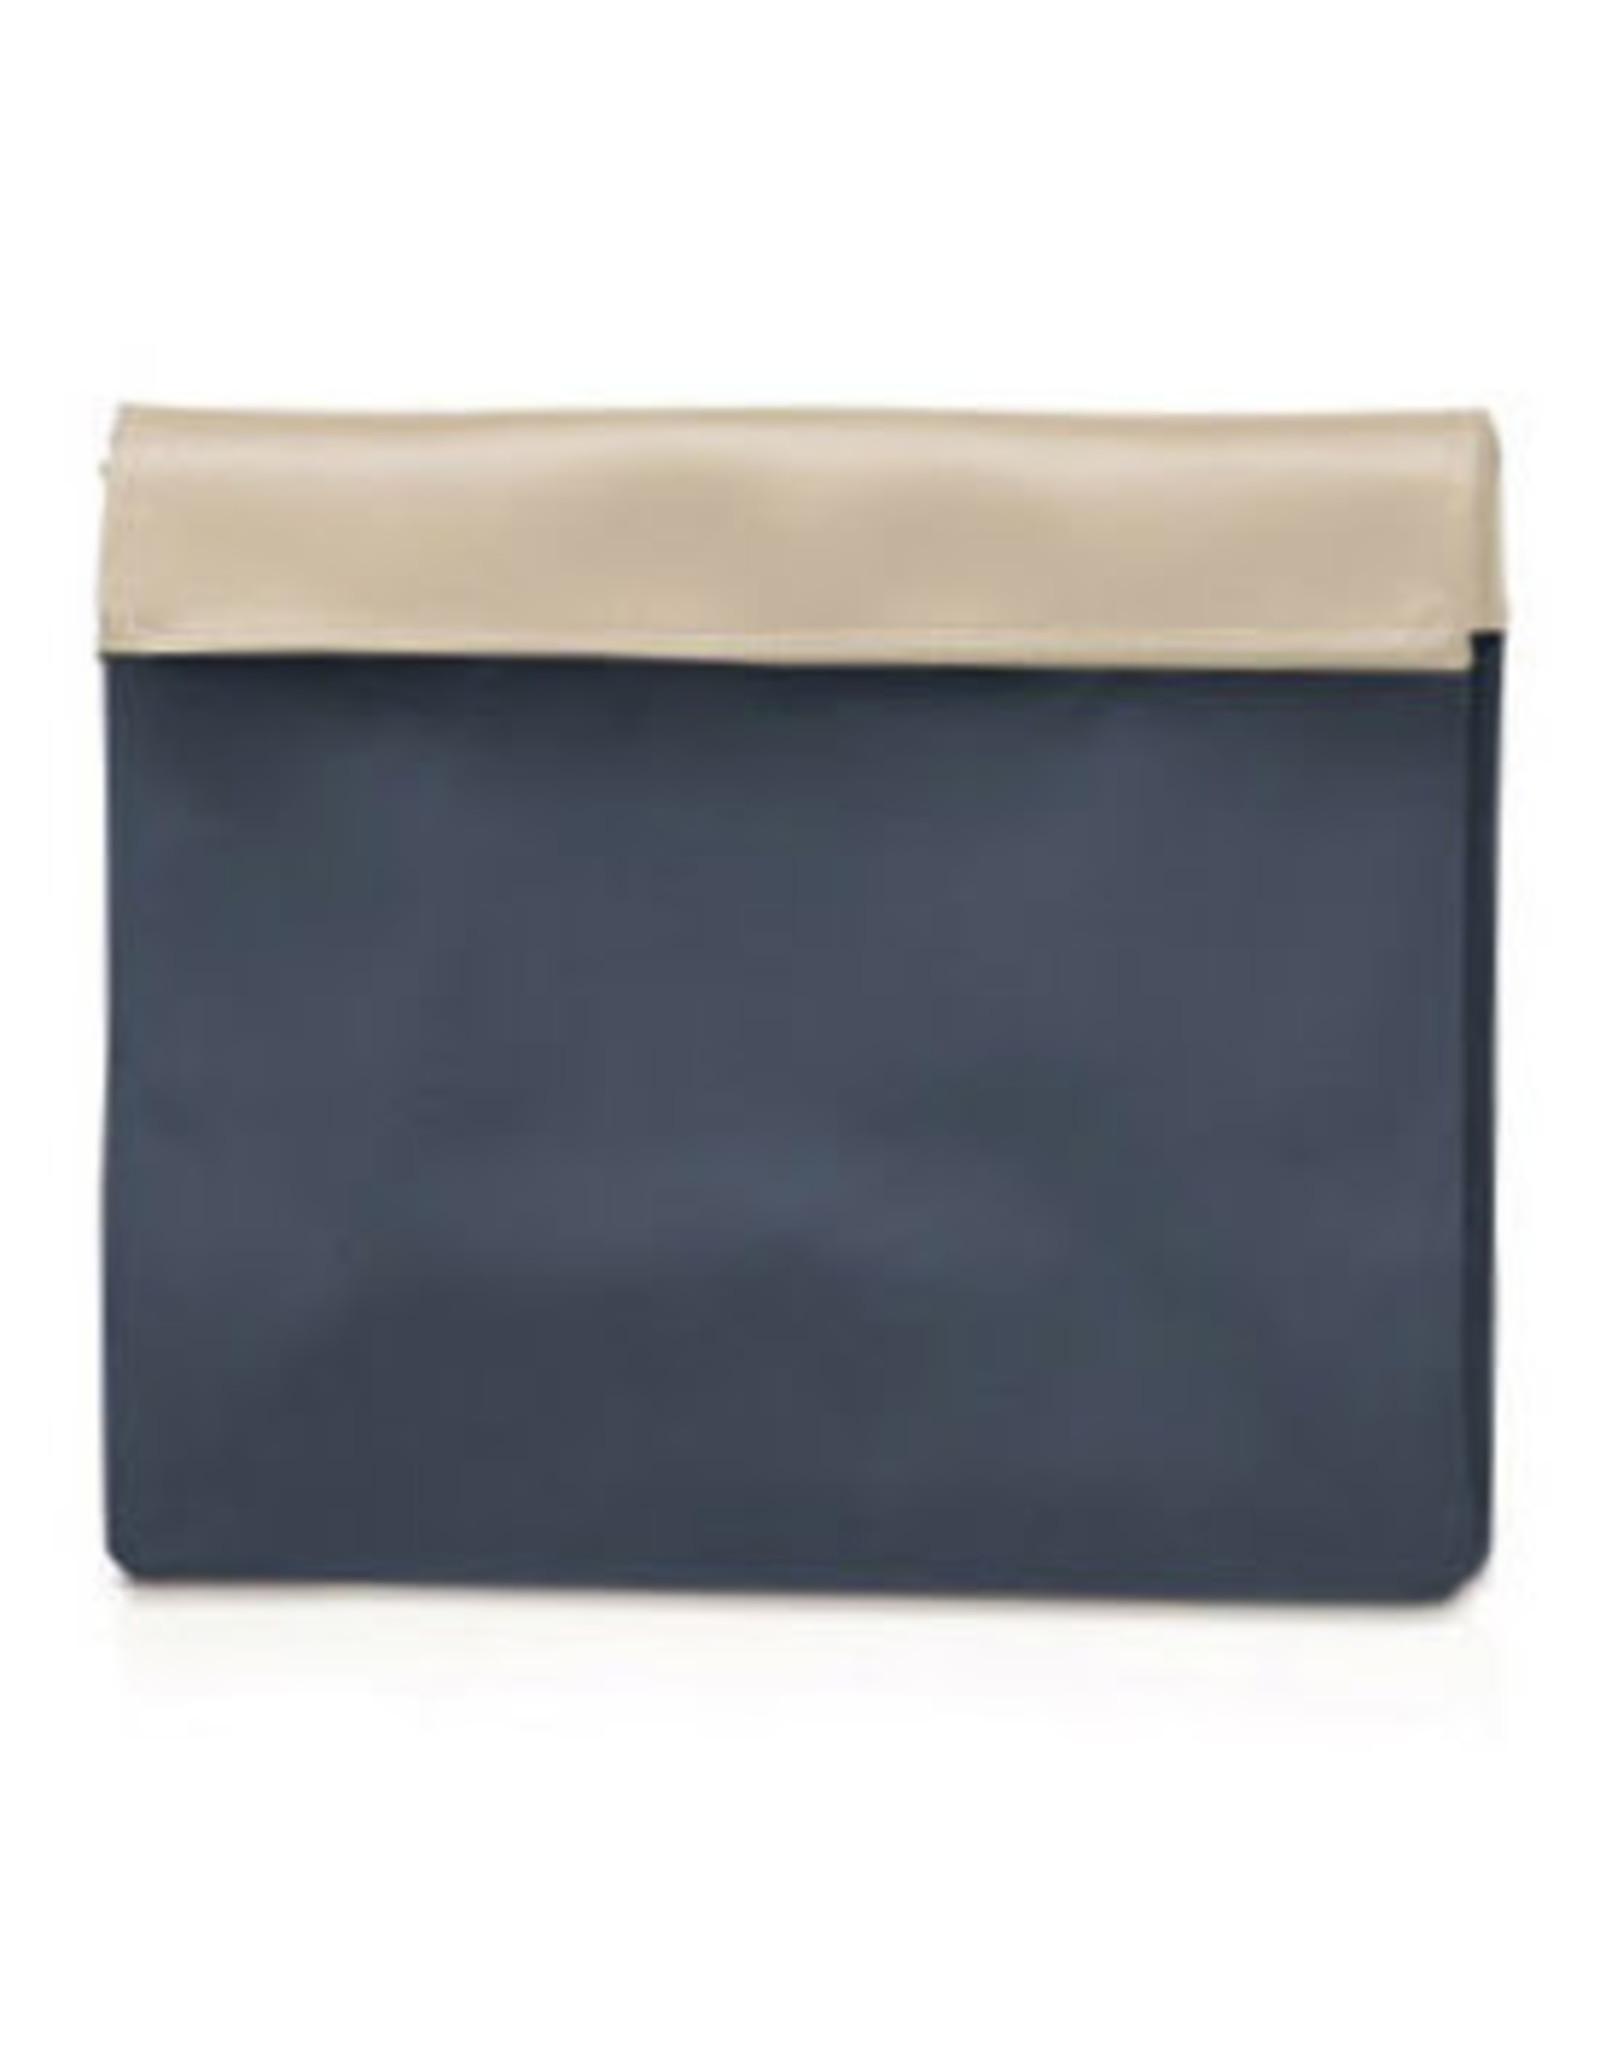 Linus LINUS, Shopper Bag, Army Navy/Beige